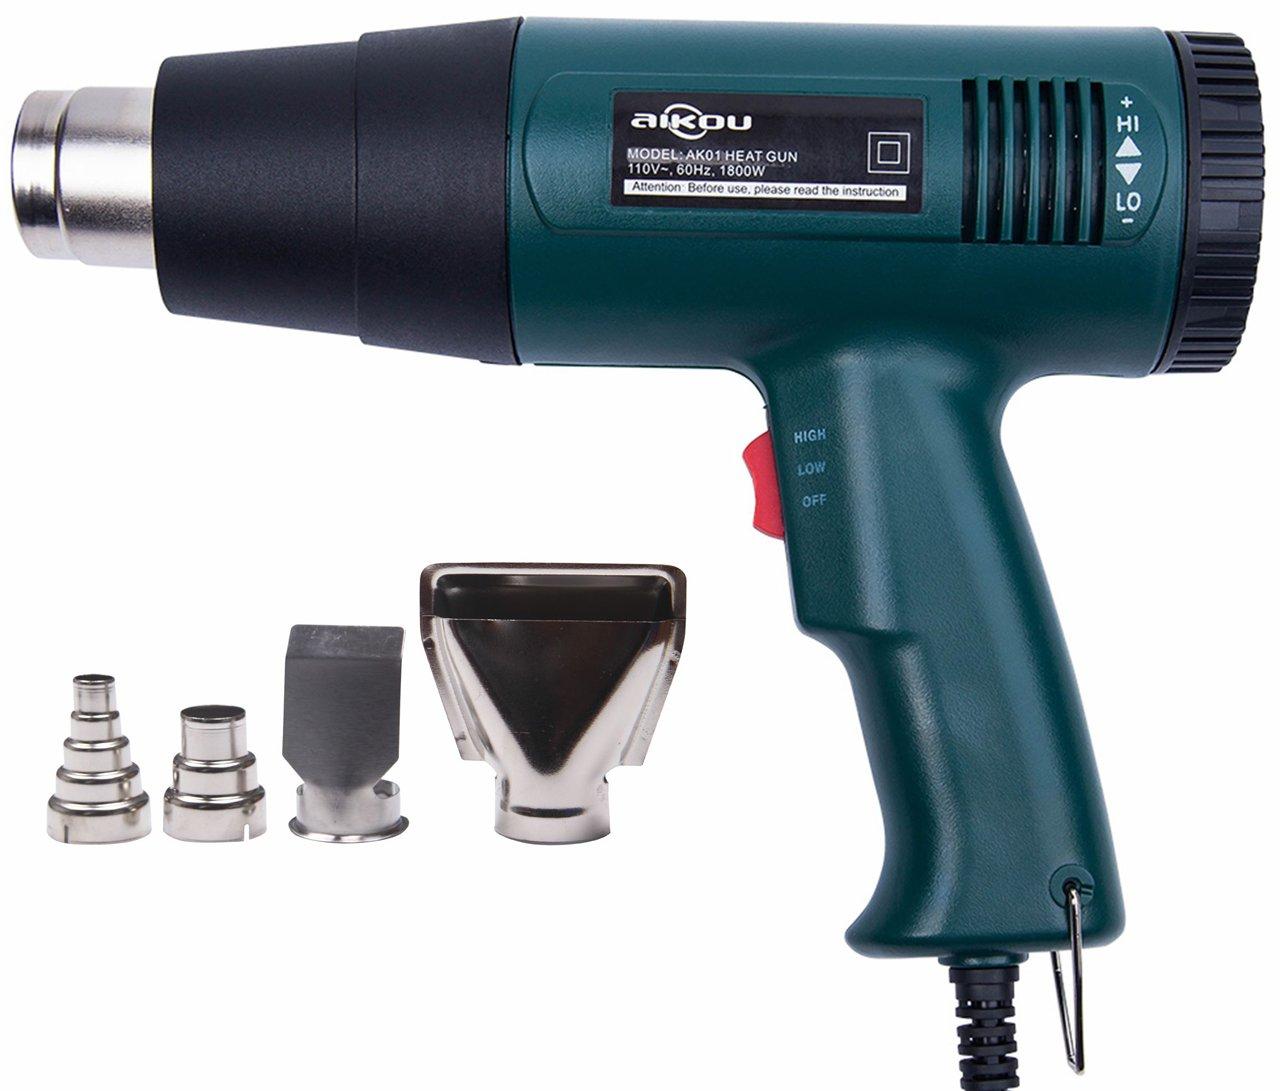 AIKOU 1800W Adjustable Temperature Power 110V Hot Air Heat Gun Fast Heating Blower Kits (Green)